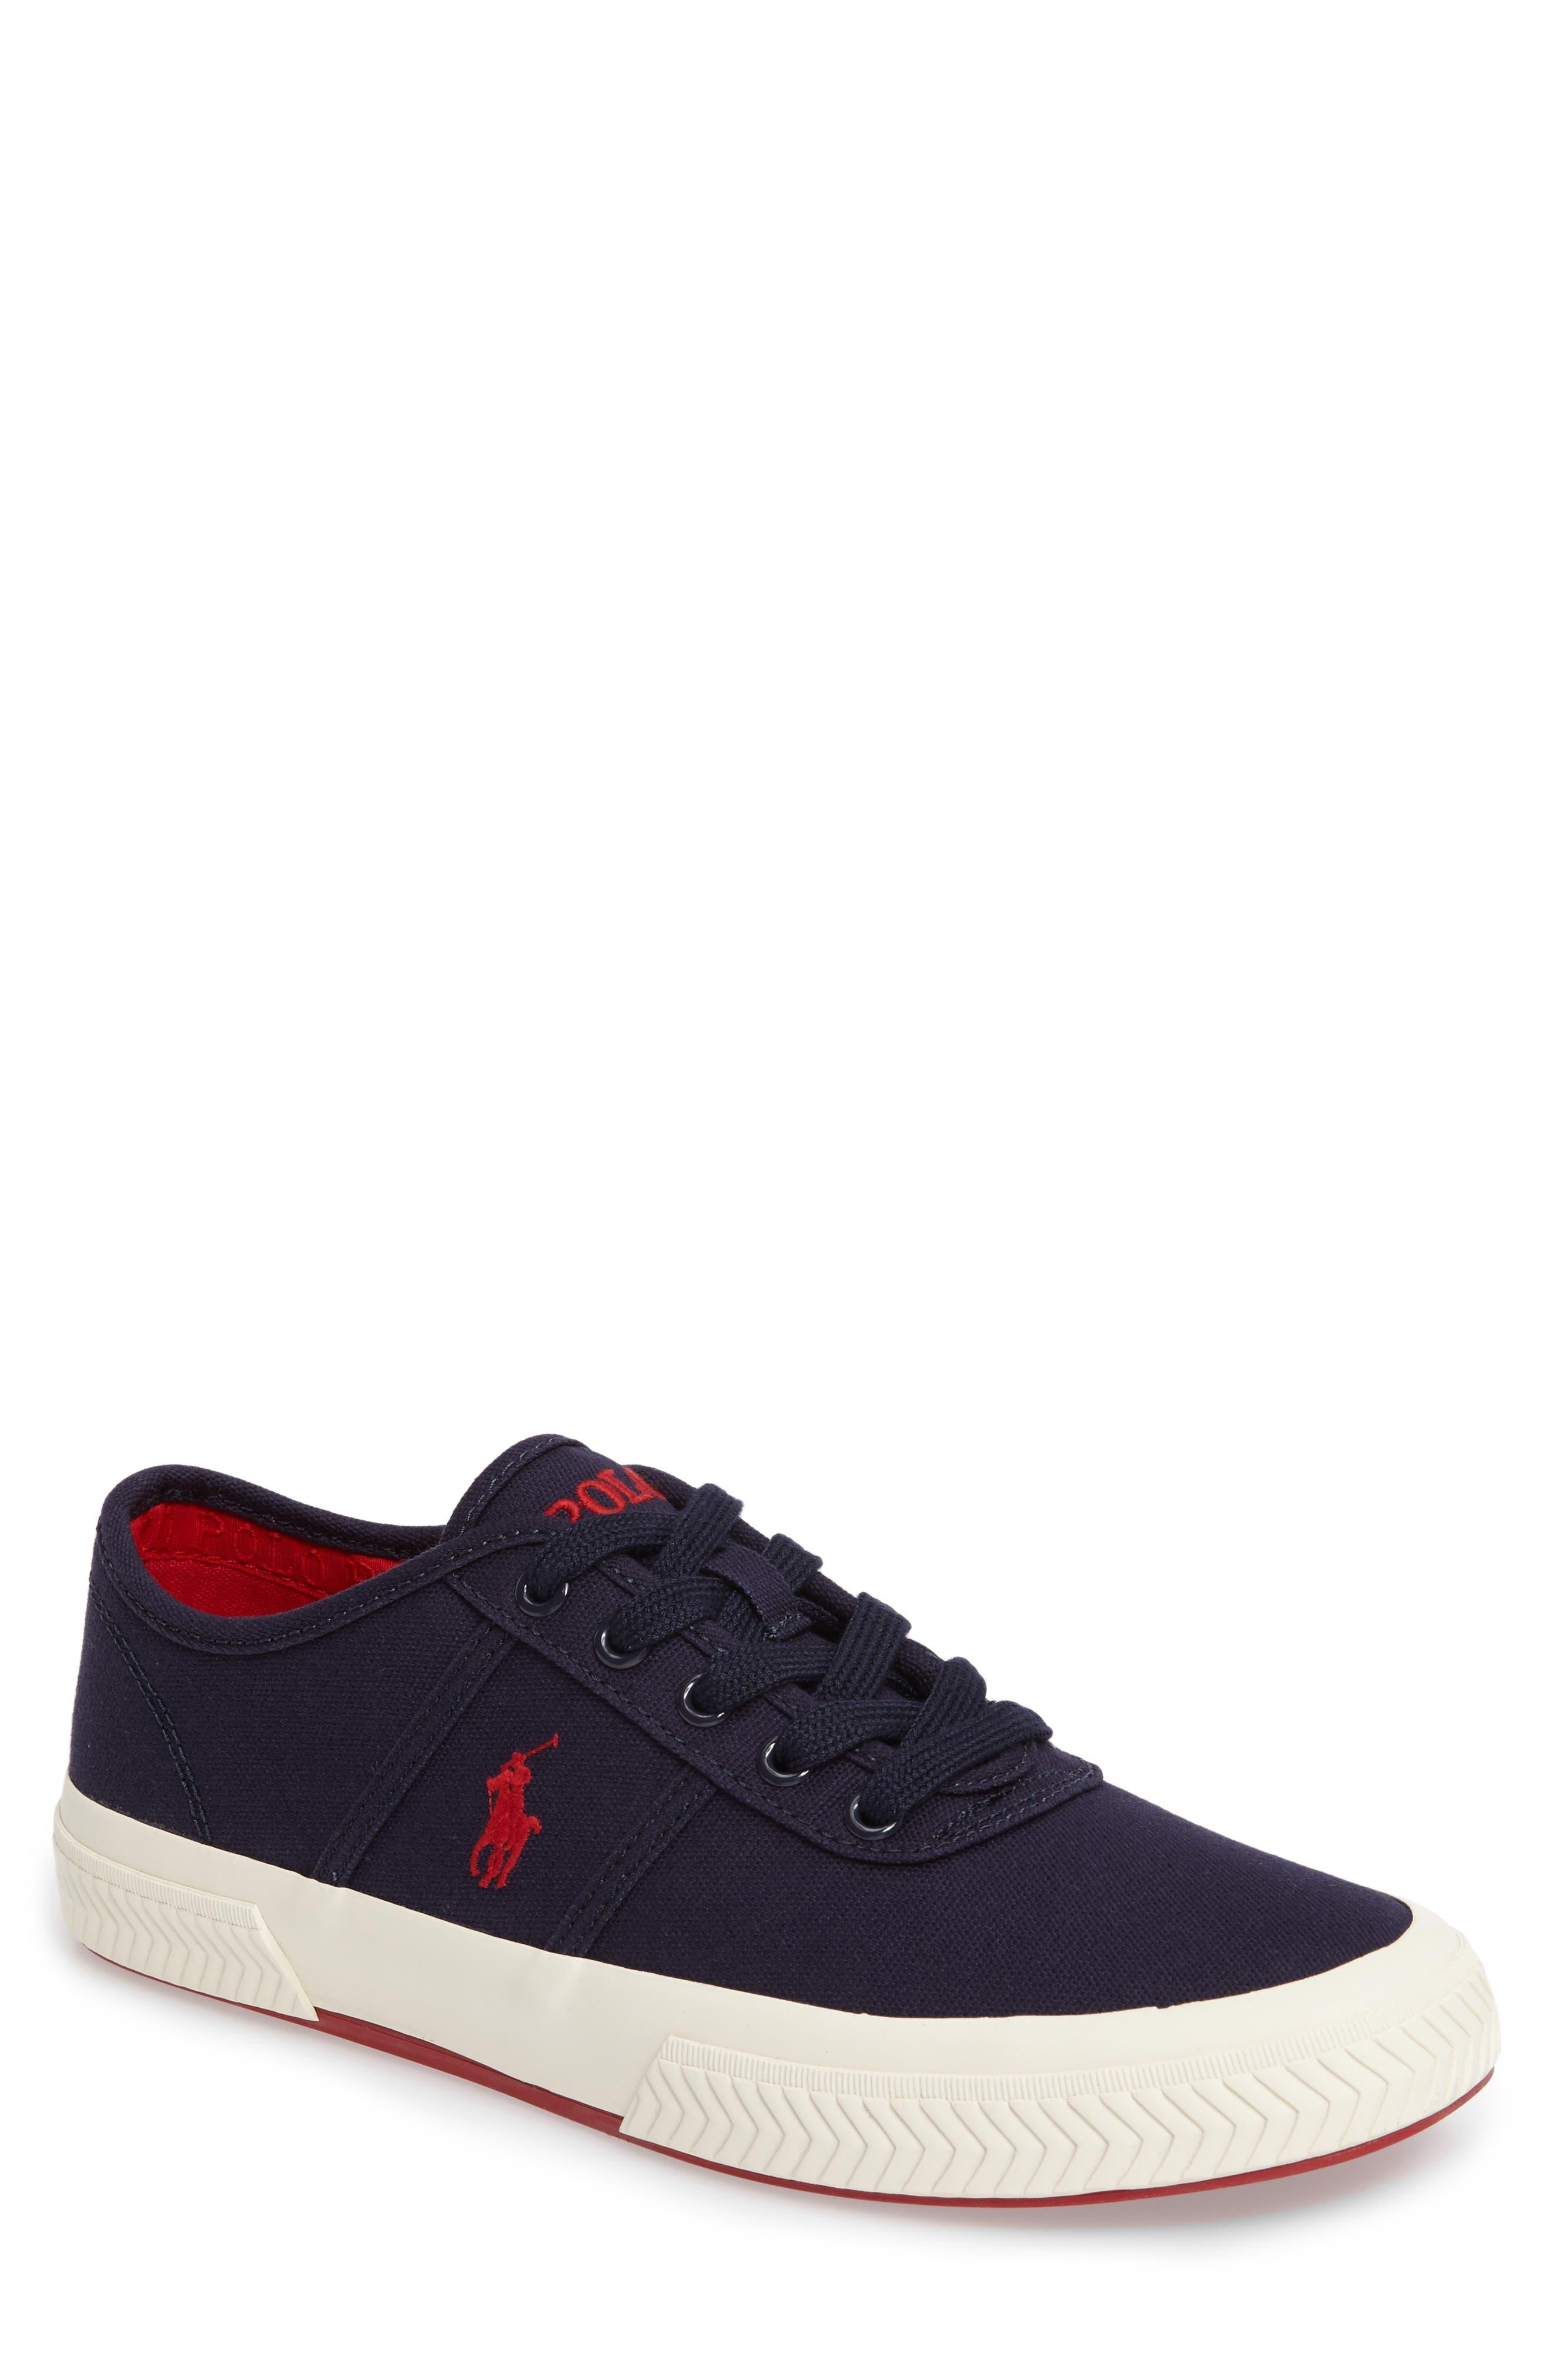 Alternate Image 1 Selected - Polo Ralph Lauren Tyrian Sneaker (Men)